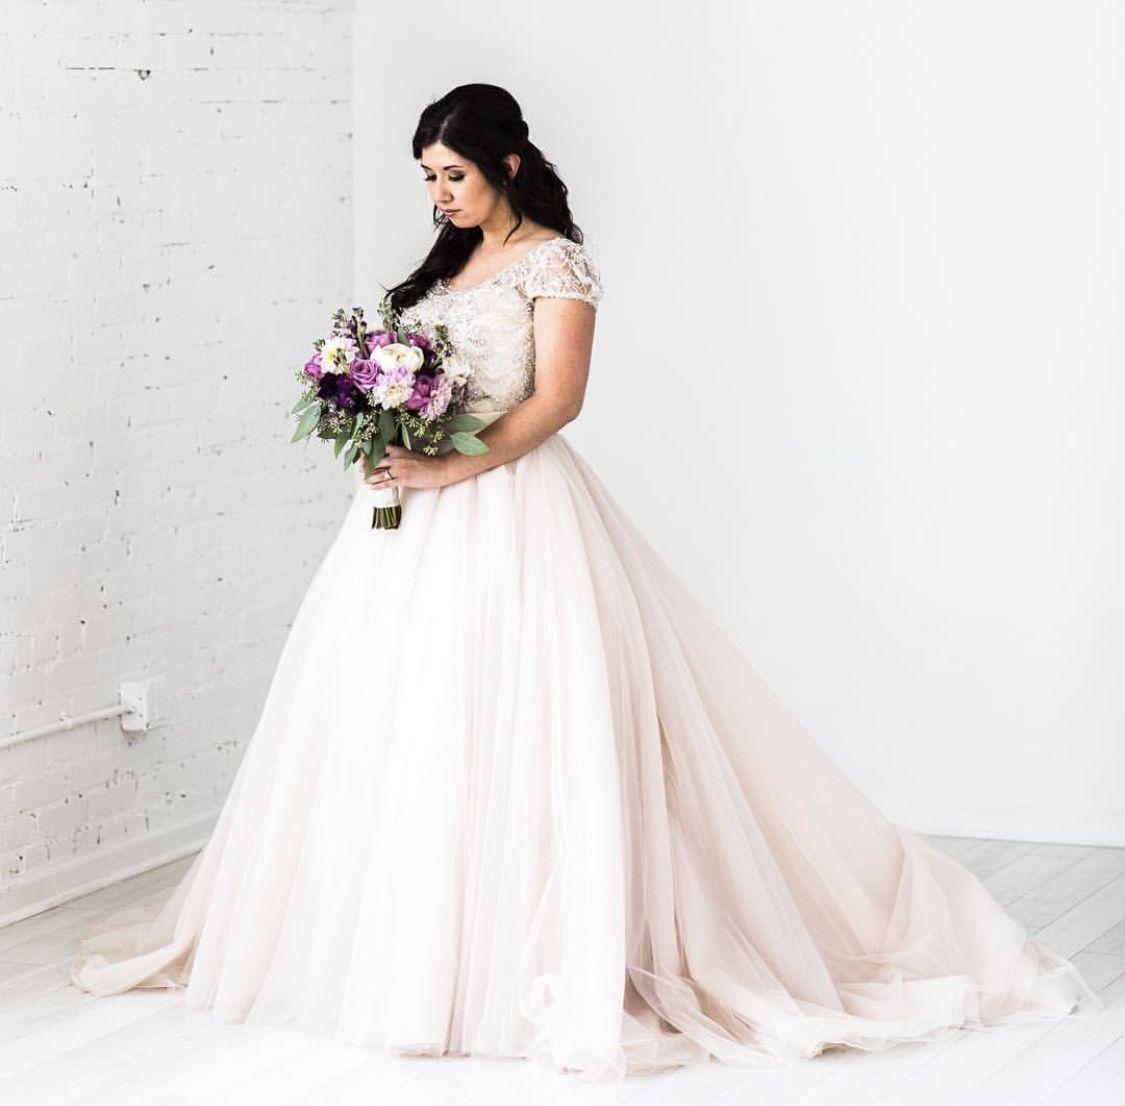 Lulus Plus Size Wedding Dresses: Lulus Bridal Bridal Boutique Dallas, Texas